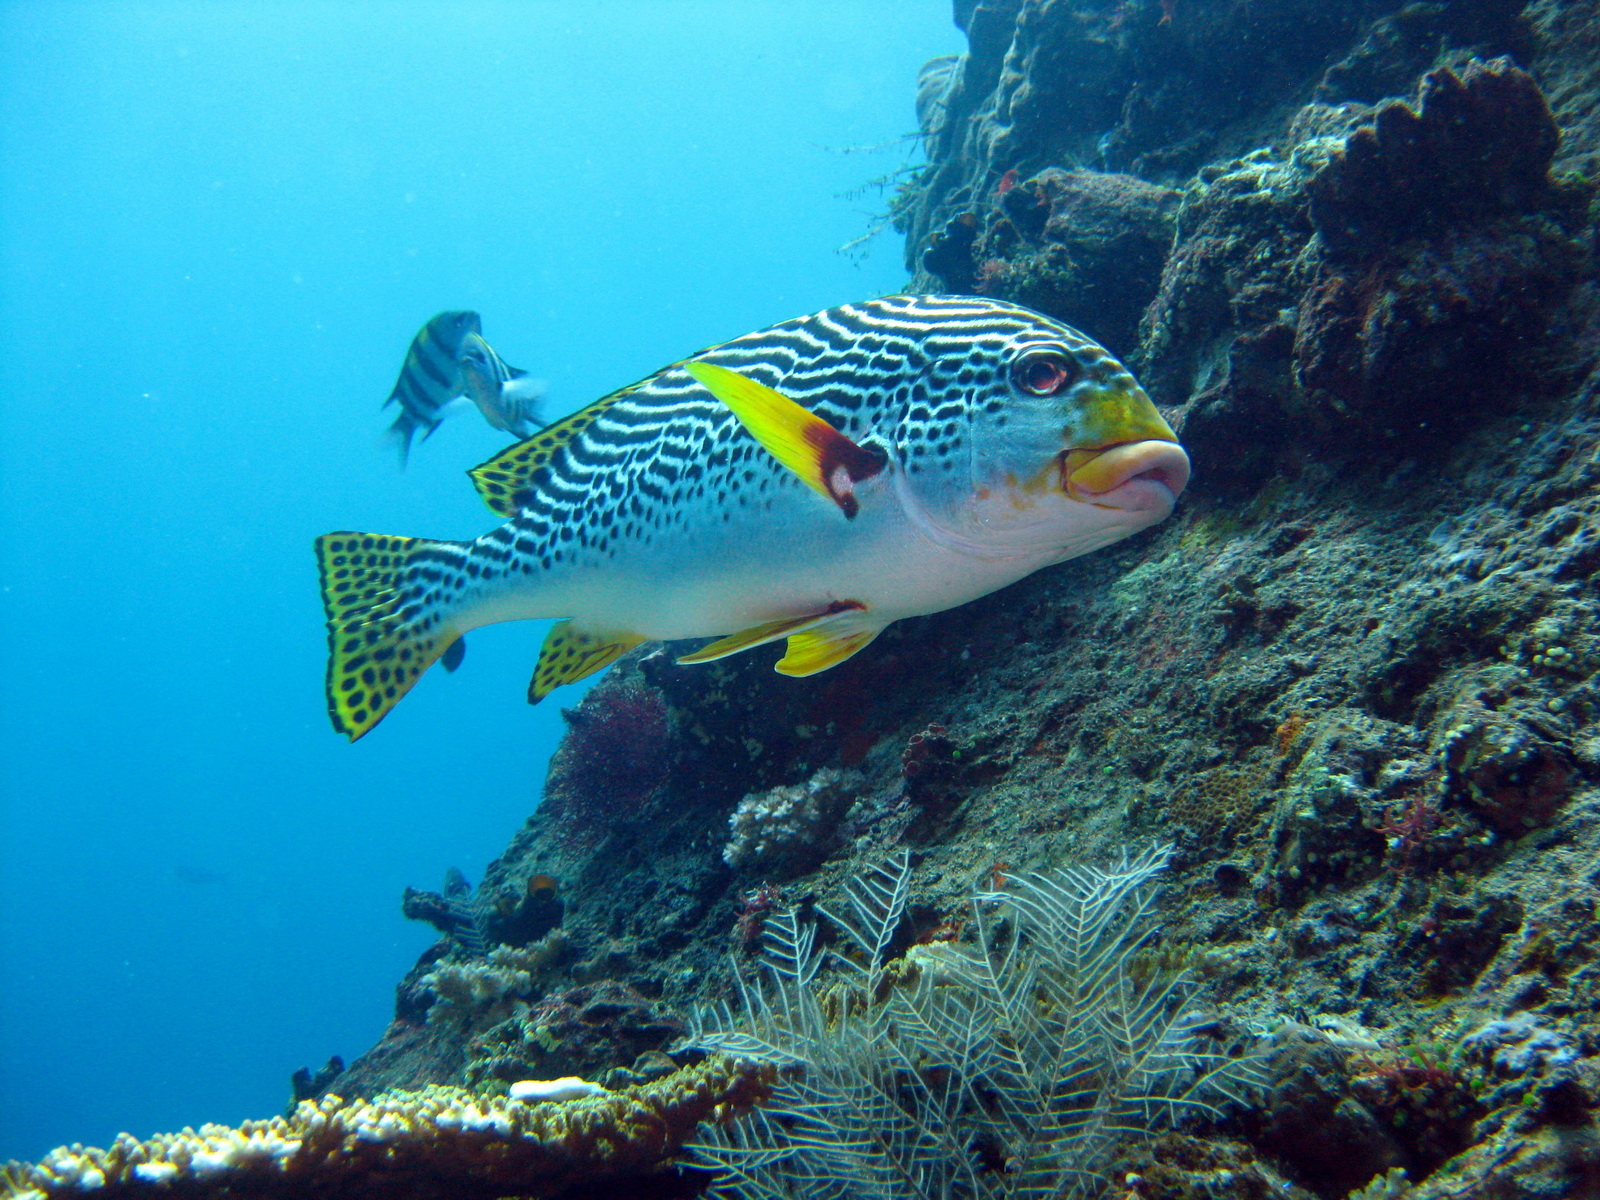 975a50cc20-4bali-lembongan-john-p-molamola Diving In Bali